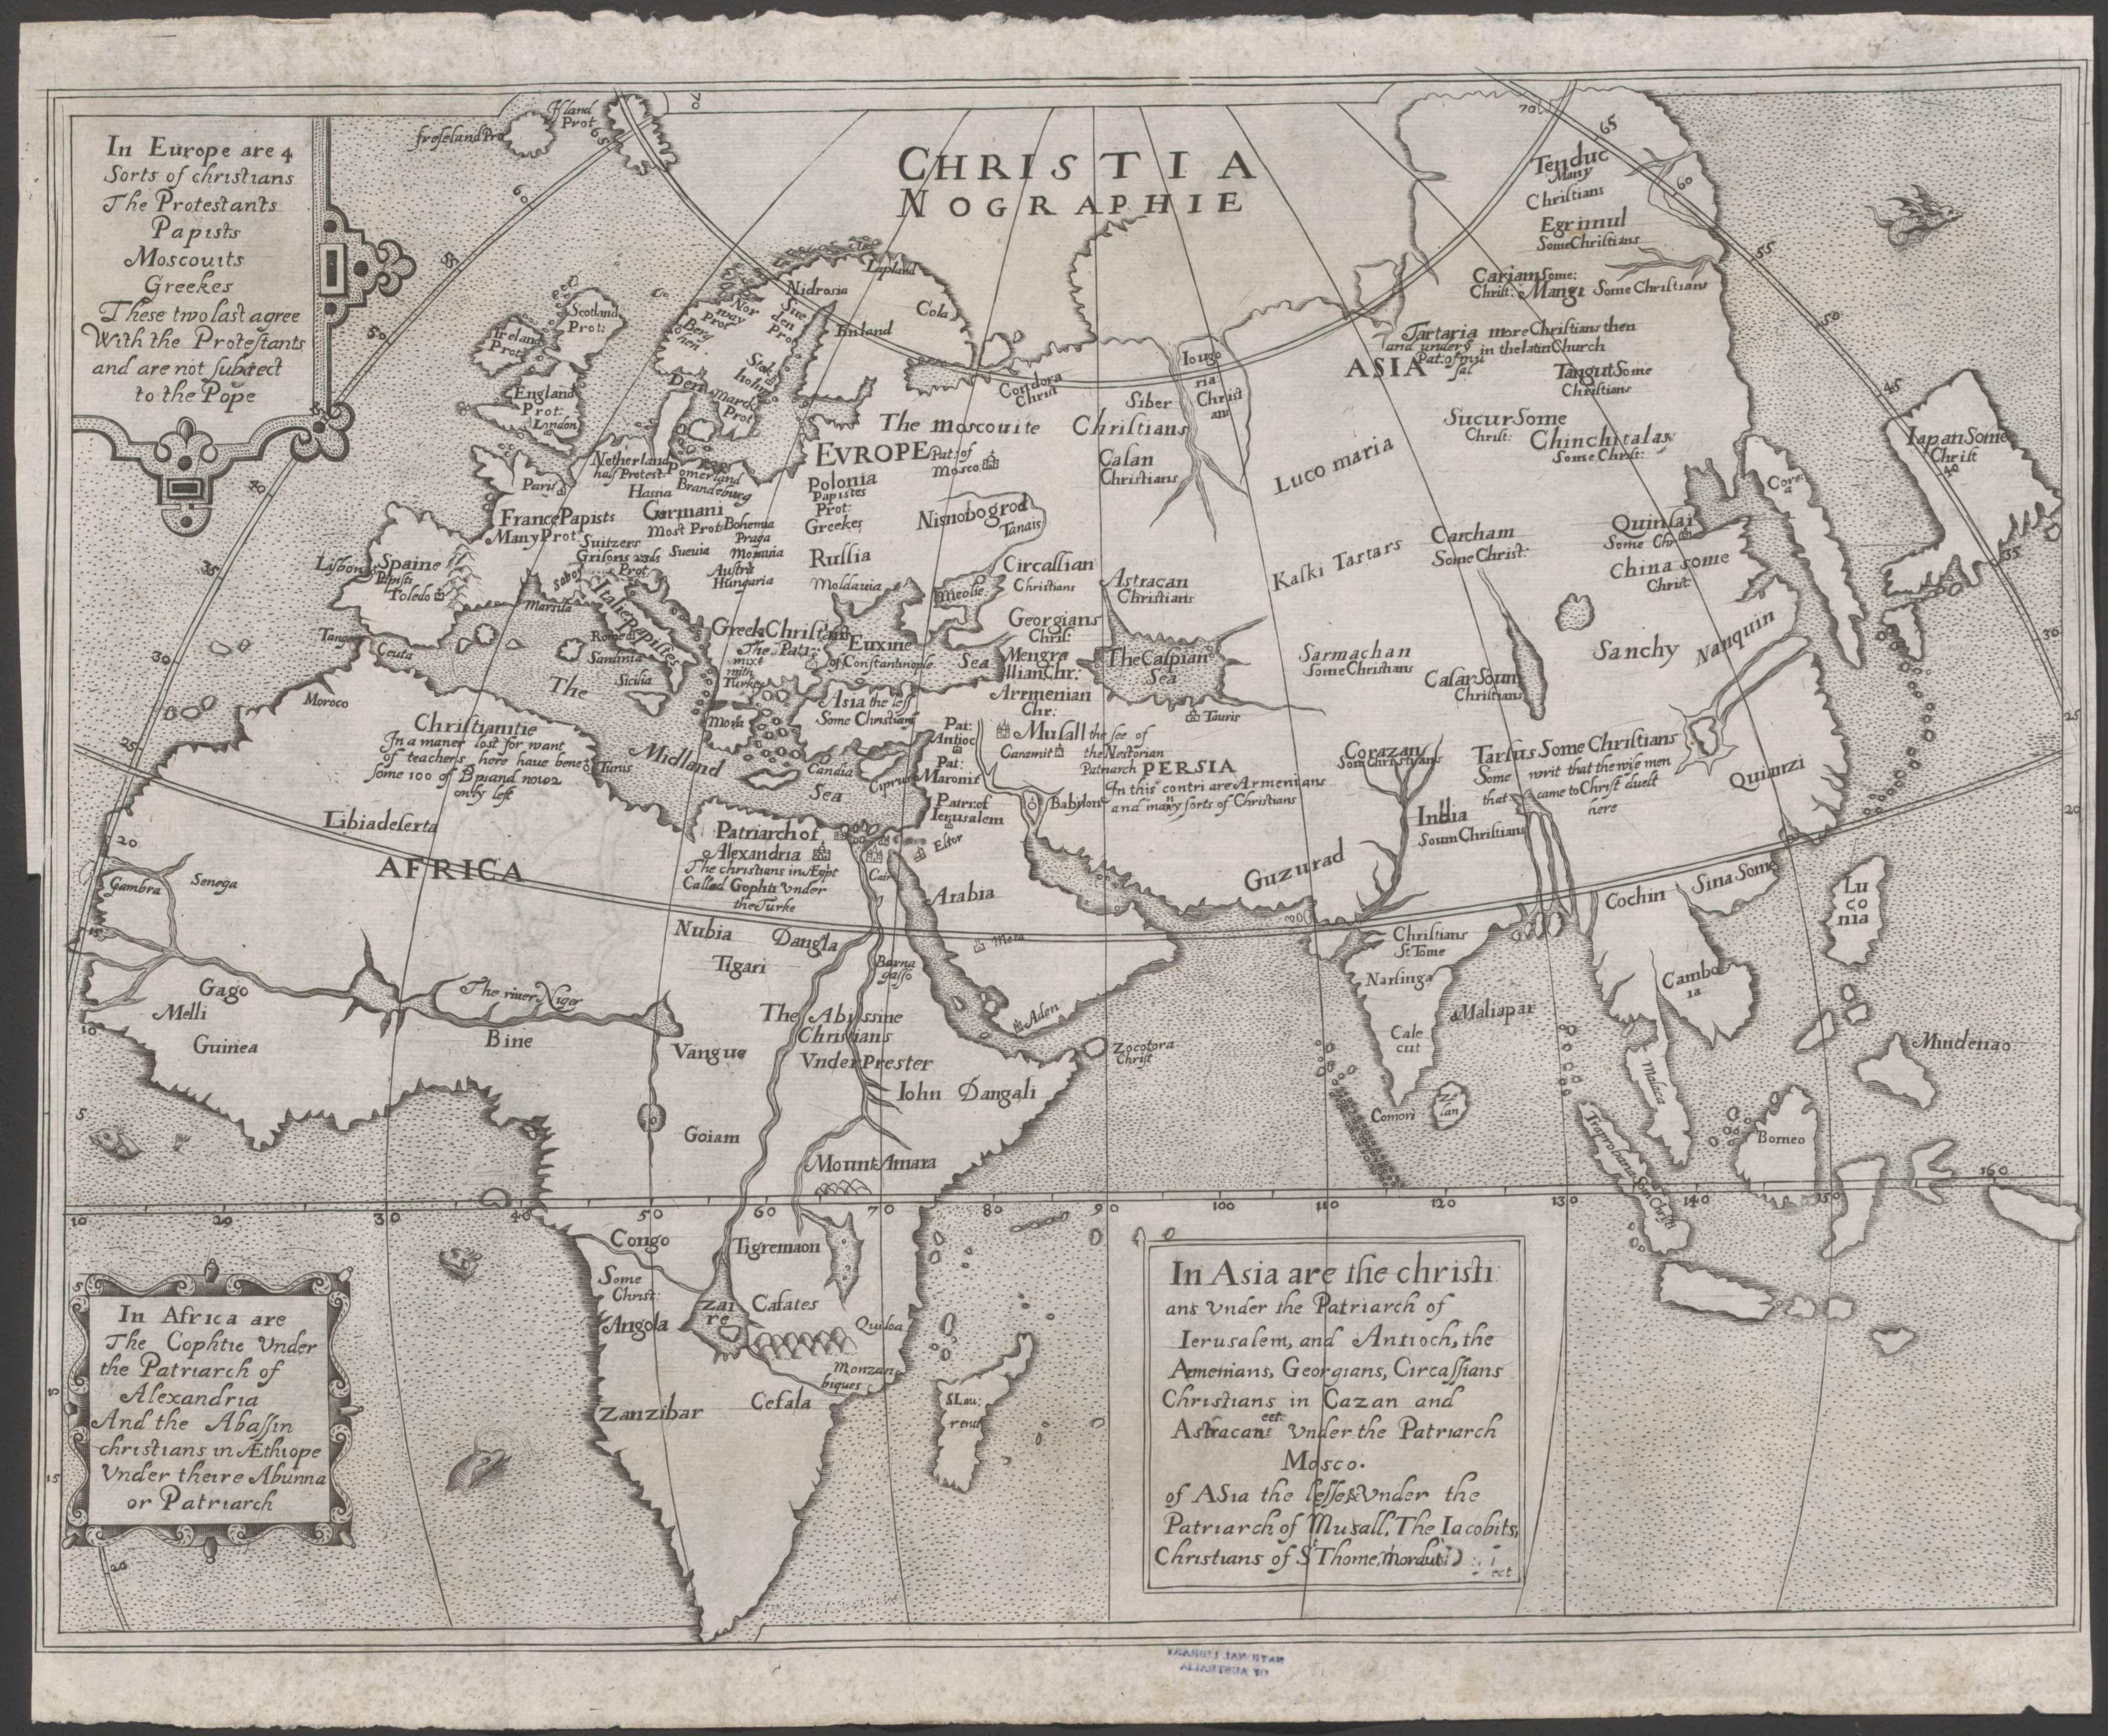 1600 map of eastern hemisphere, excluding Australia | Old Maps ...